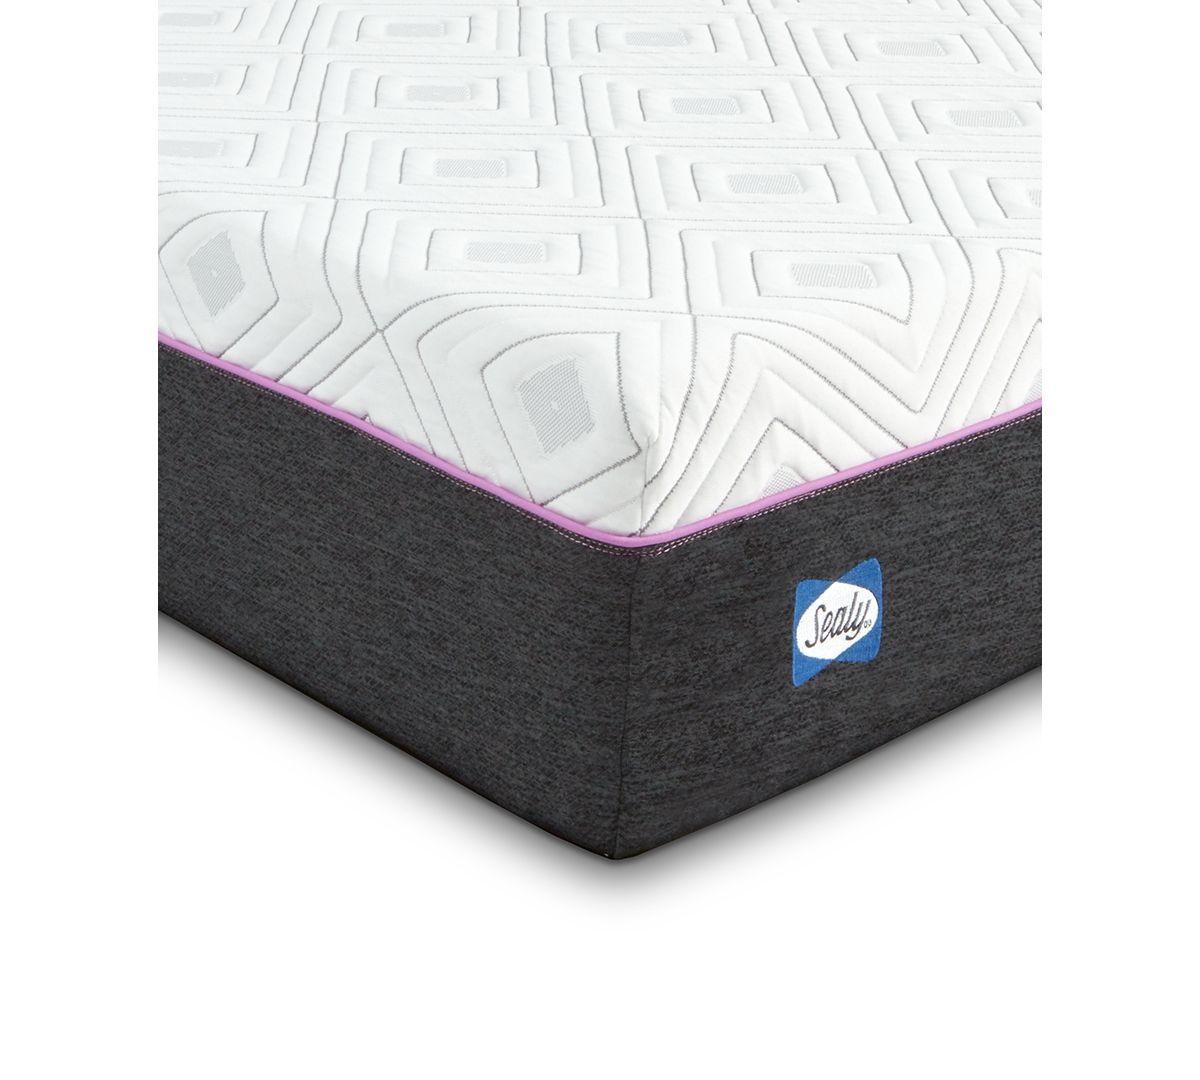 Sealy to Go 10'' Hybrid Cushion Firm Mattress Twin XL